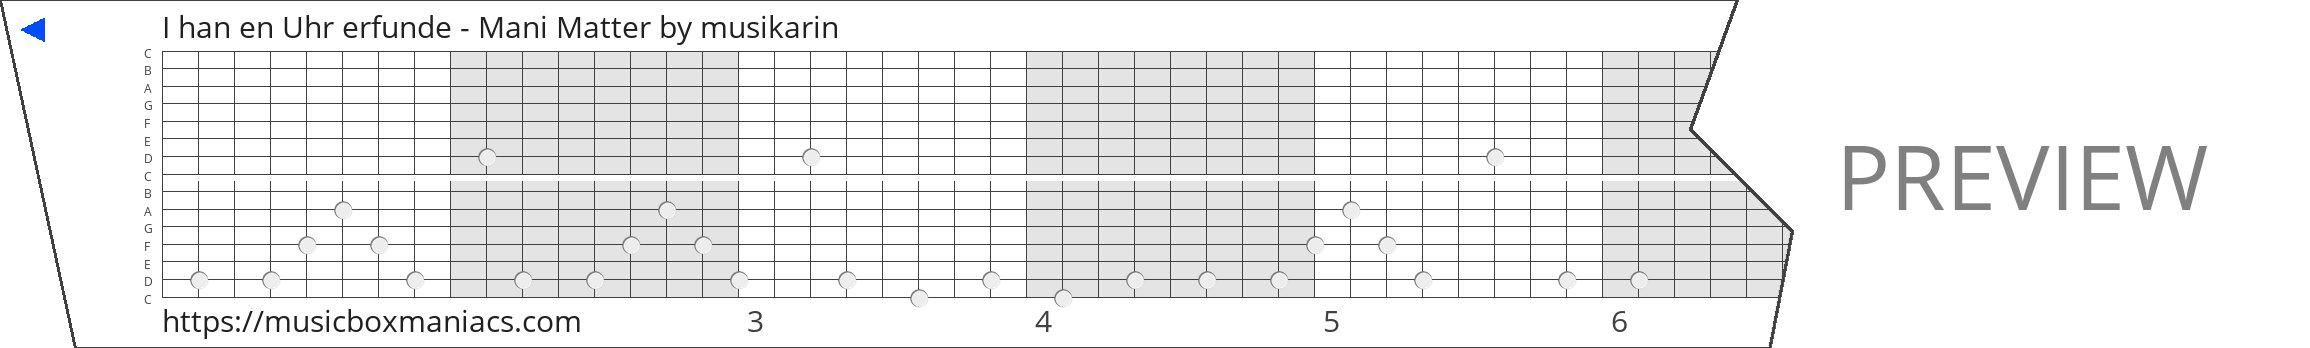 I han en Uhr erfunde - Mani Matter 15 note music box paper strip